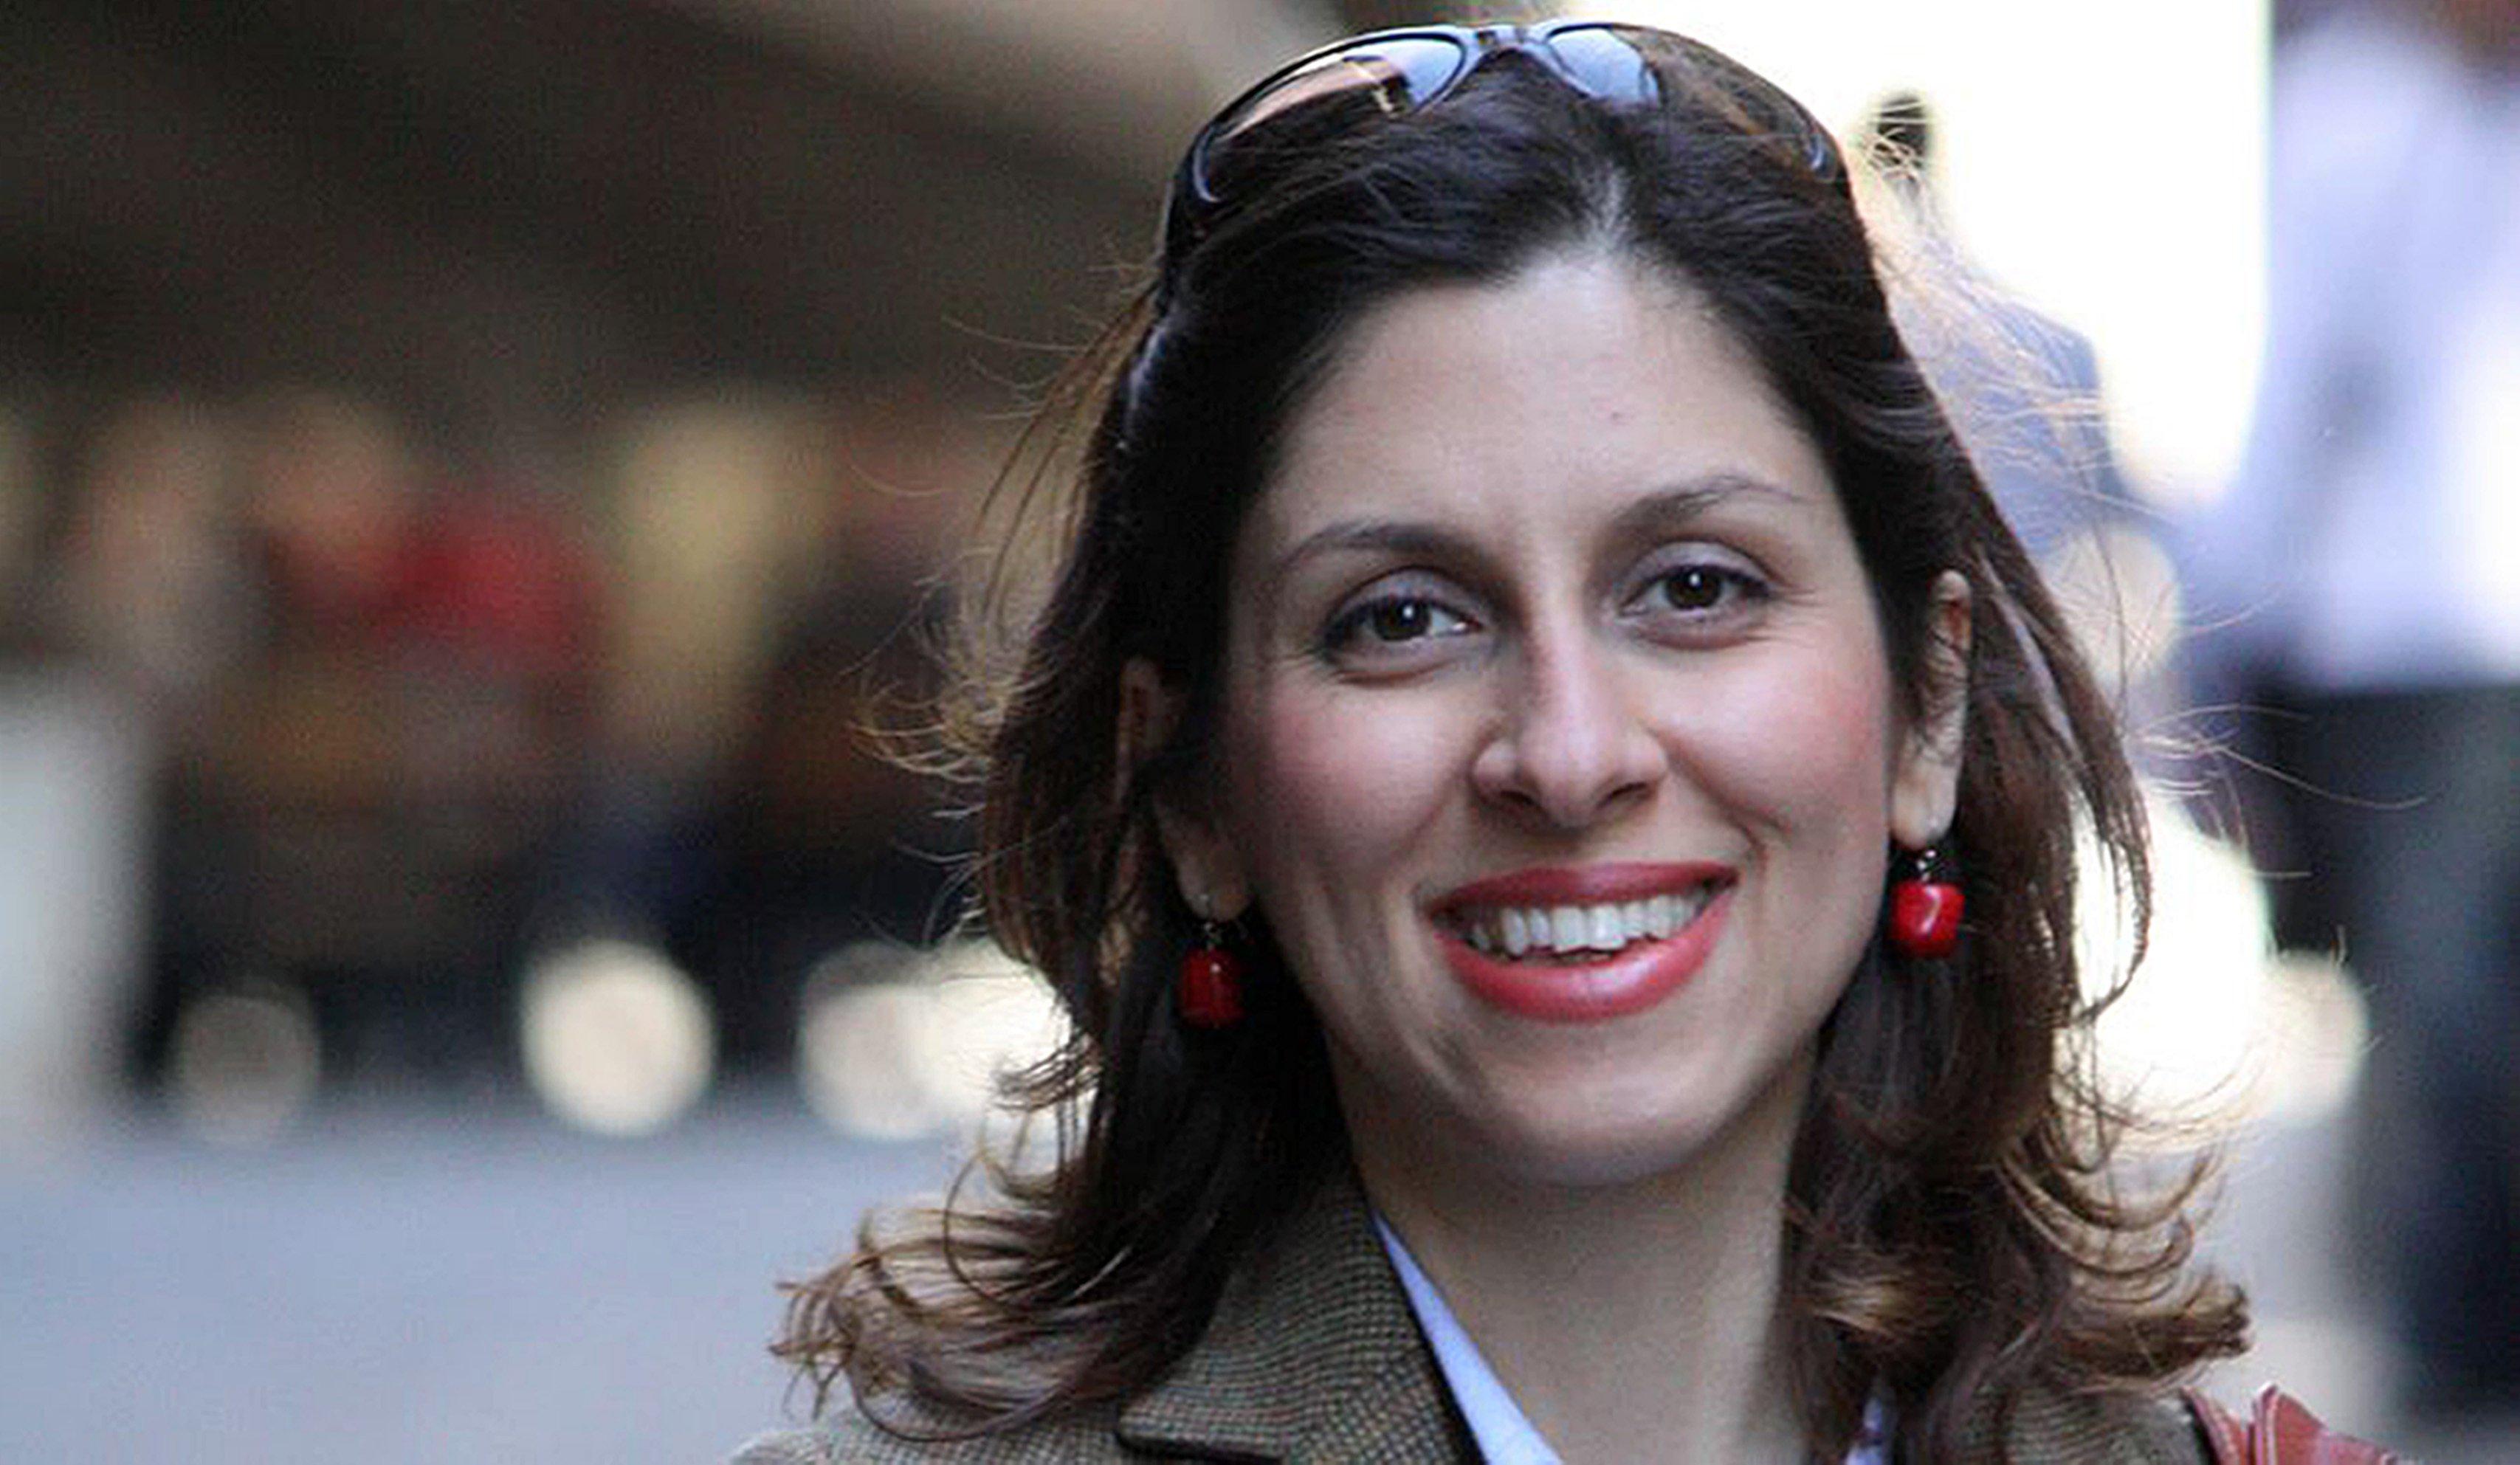 Hopes raised that Nazanin Zaghari-Ratcliffe's ordeal in Iran reaching 'endgame'